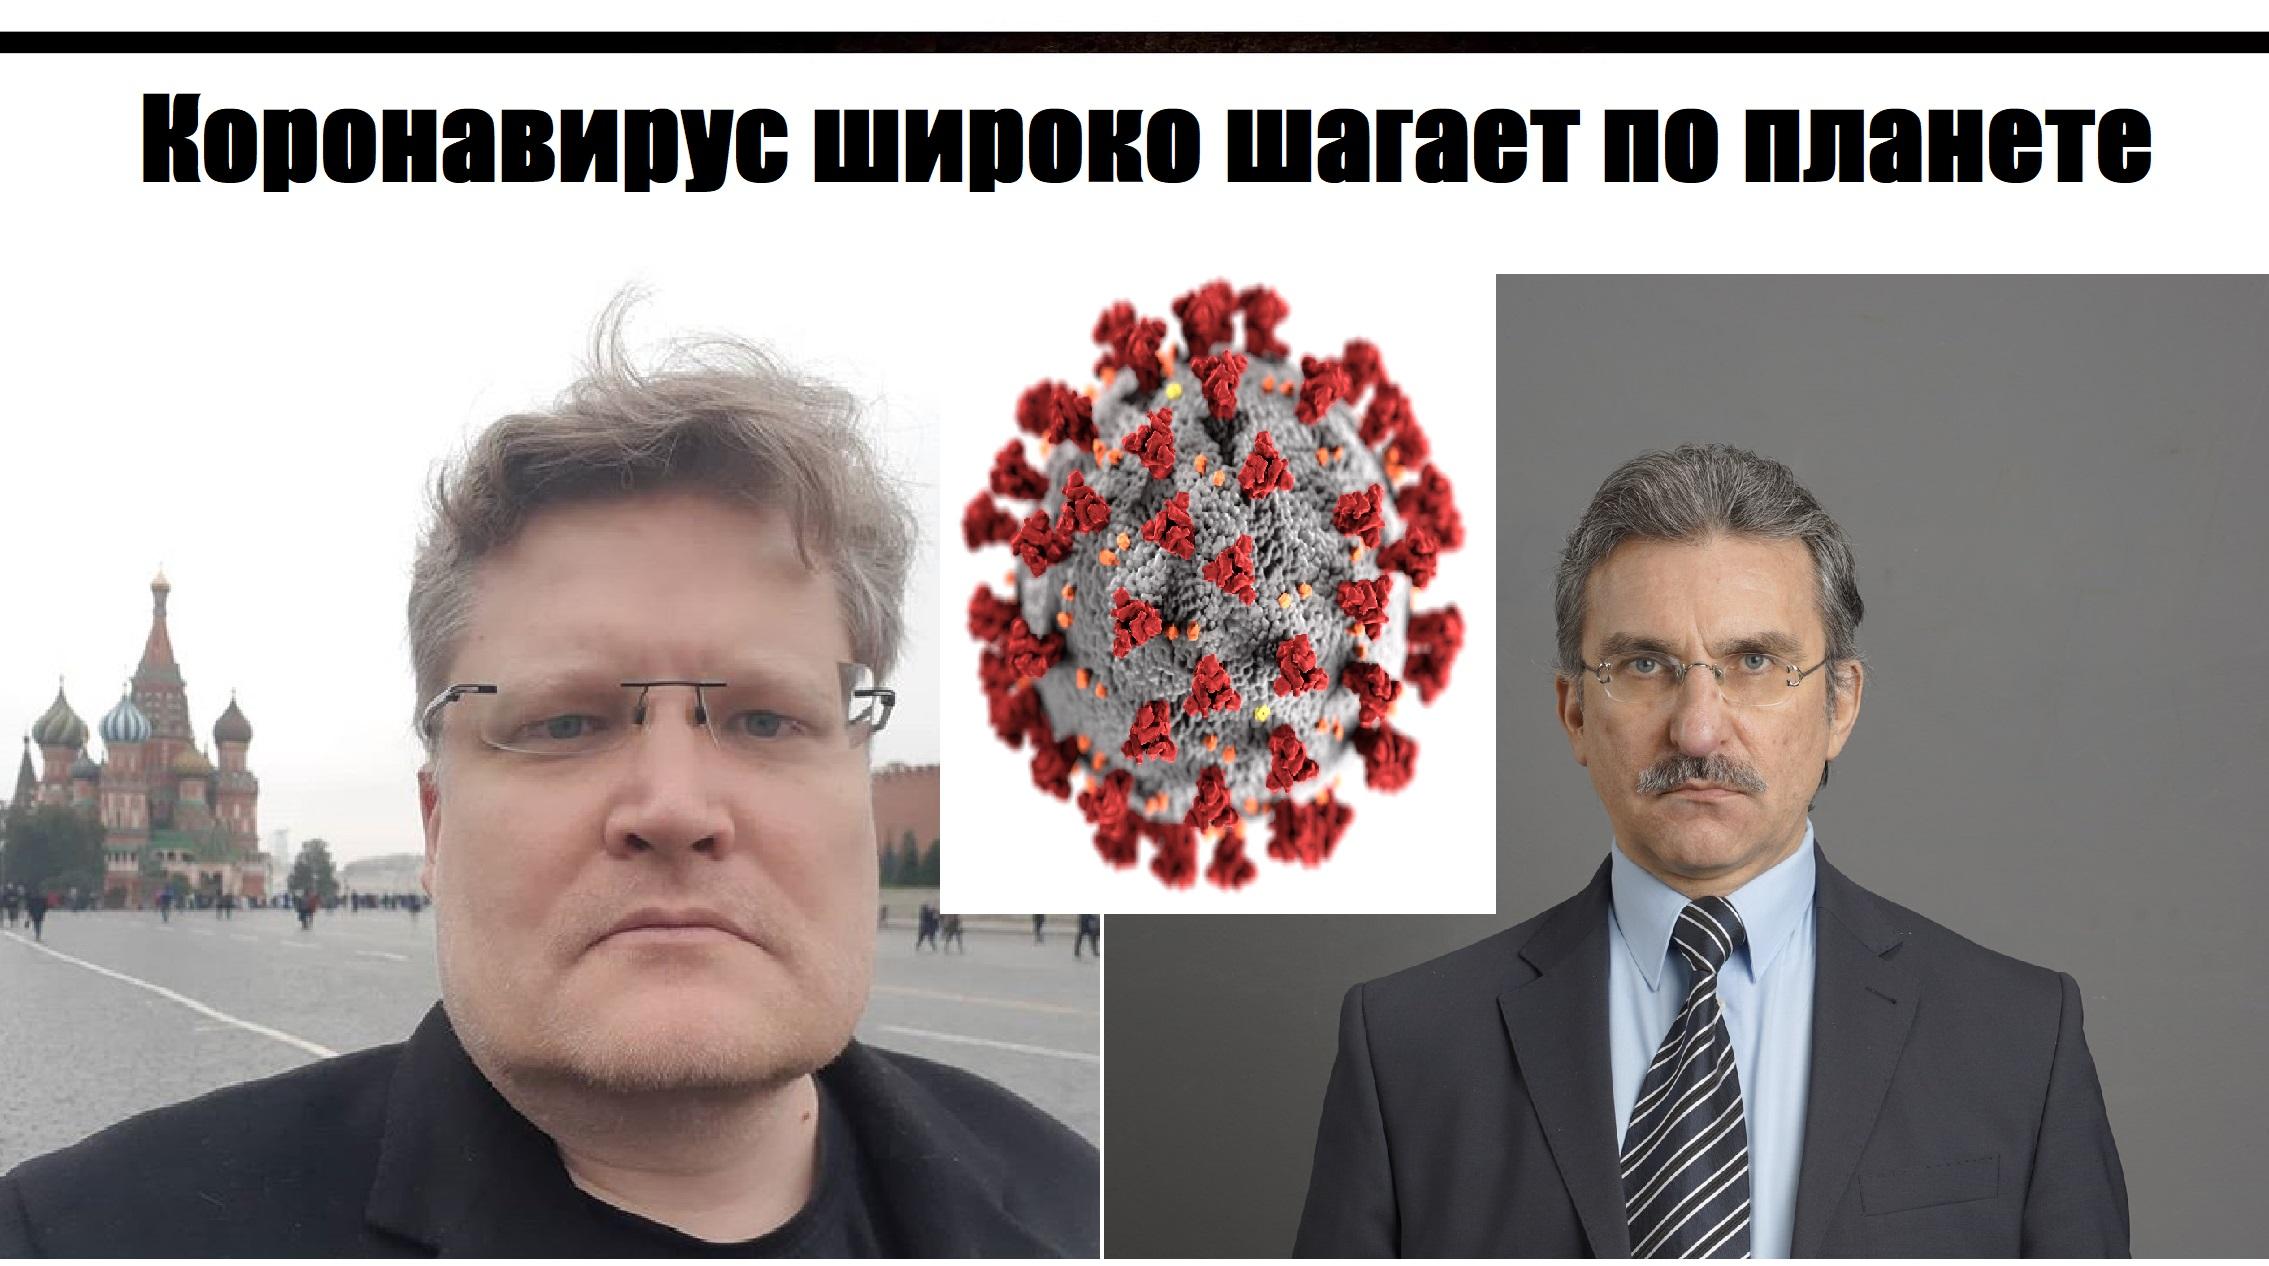 Коронавирус Русский Интерес